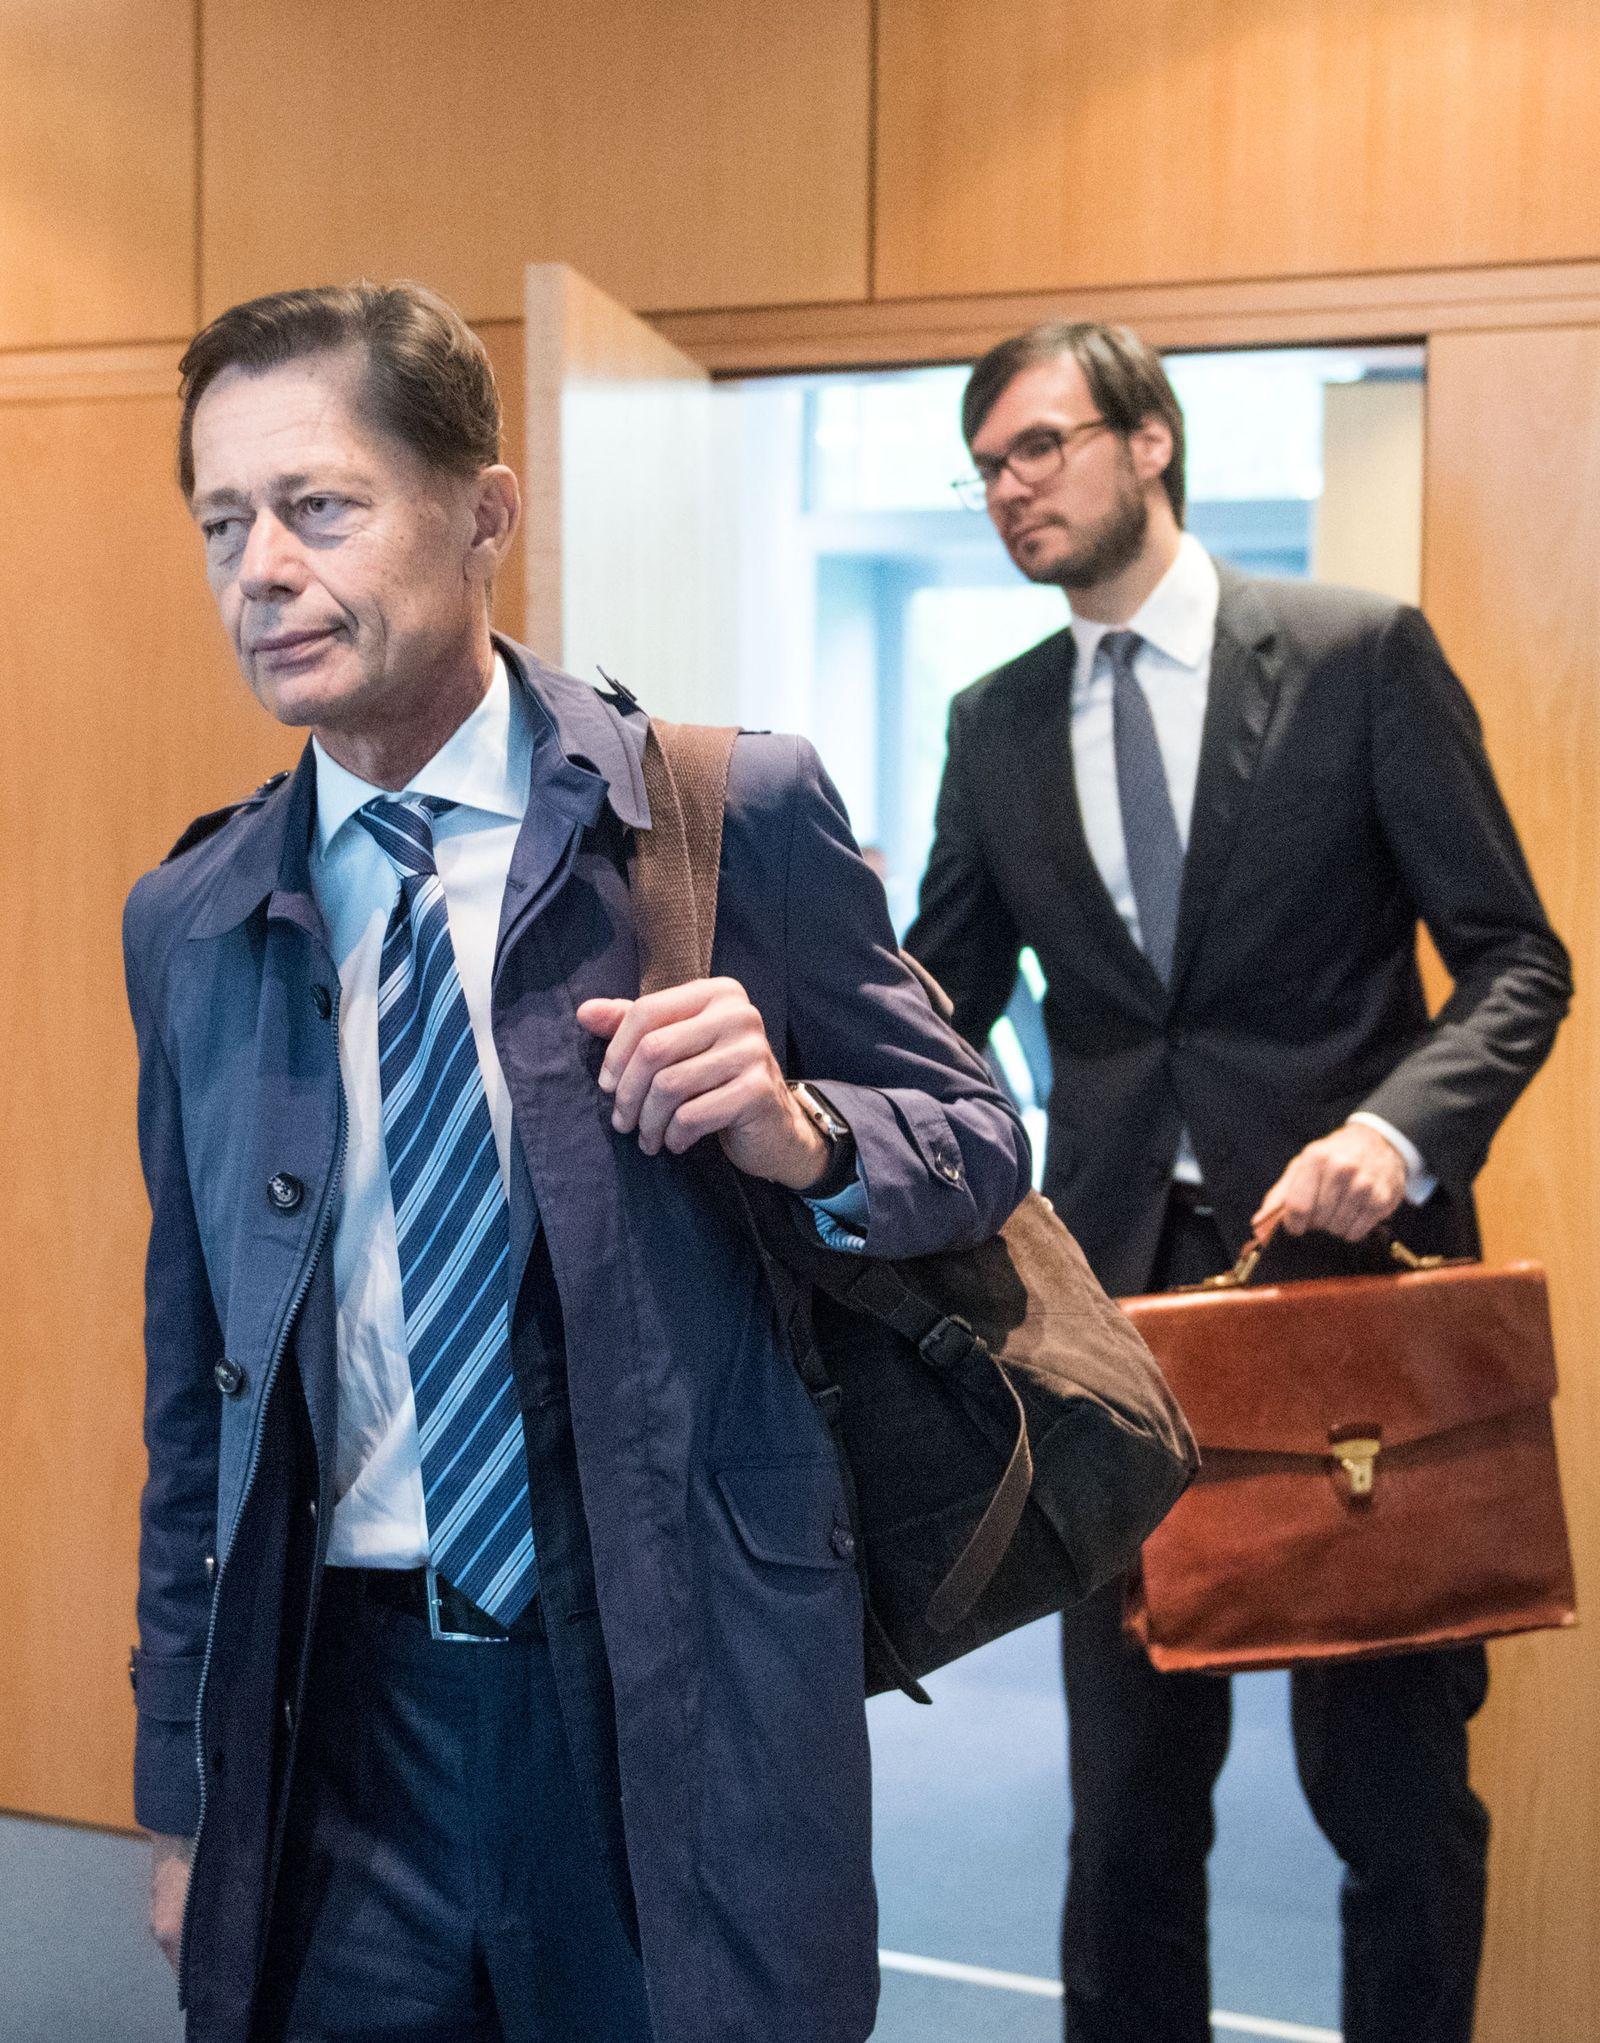 Oberlandesgericht hört Zeuge Middelhoff